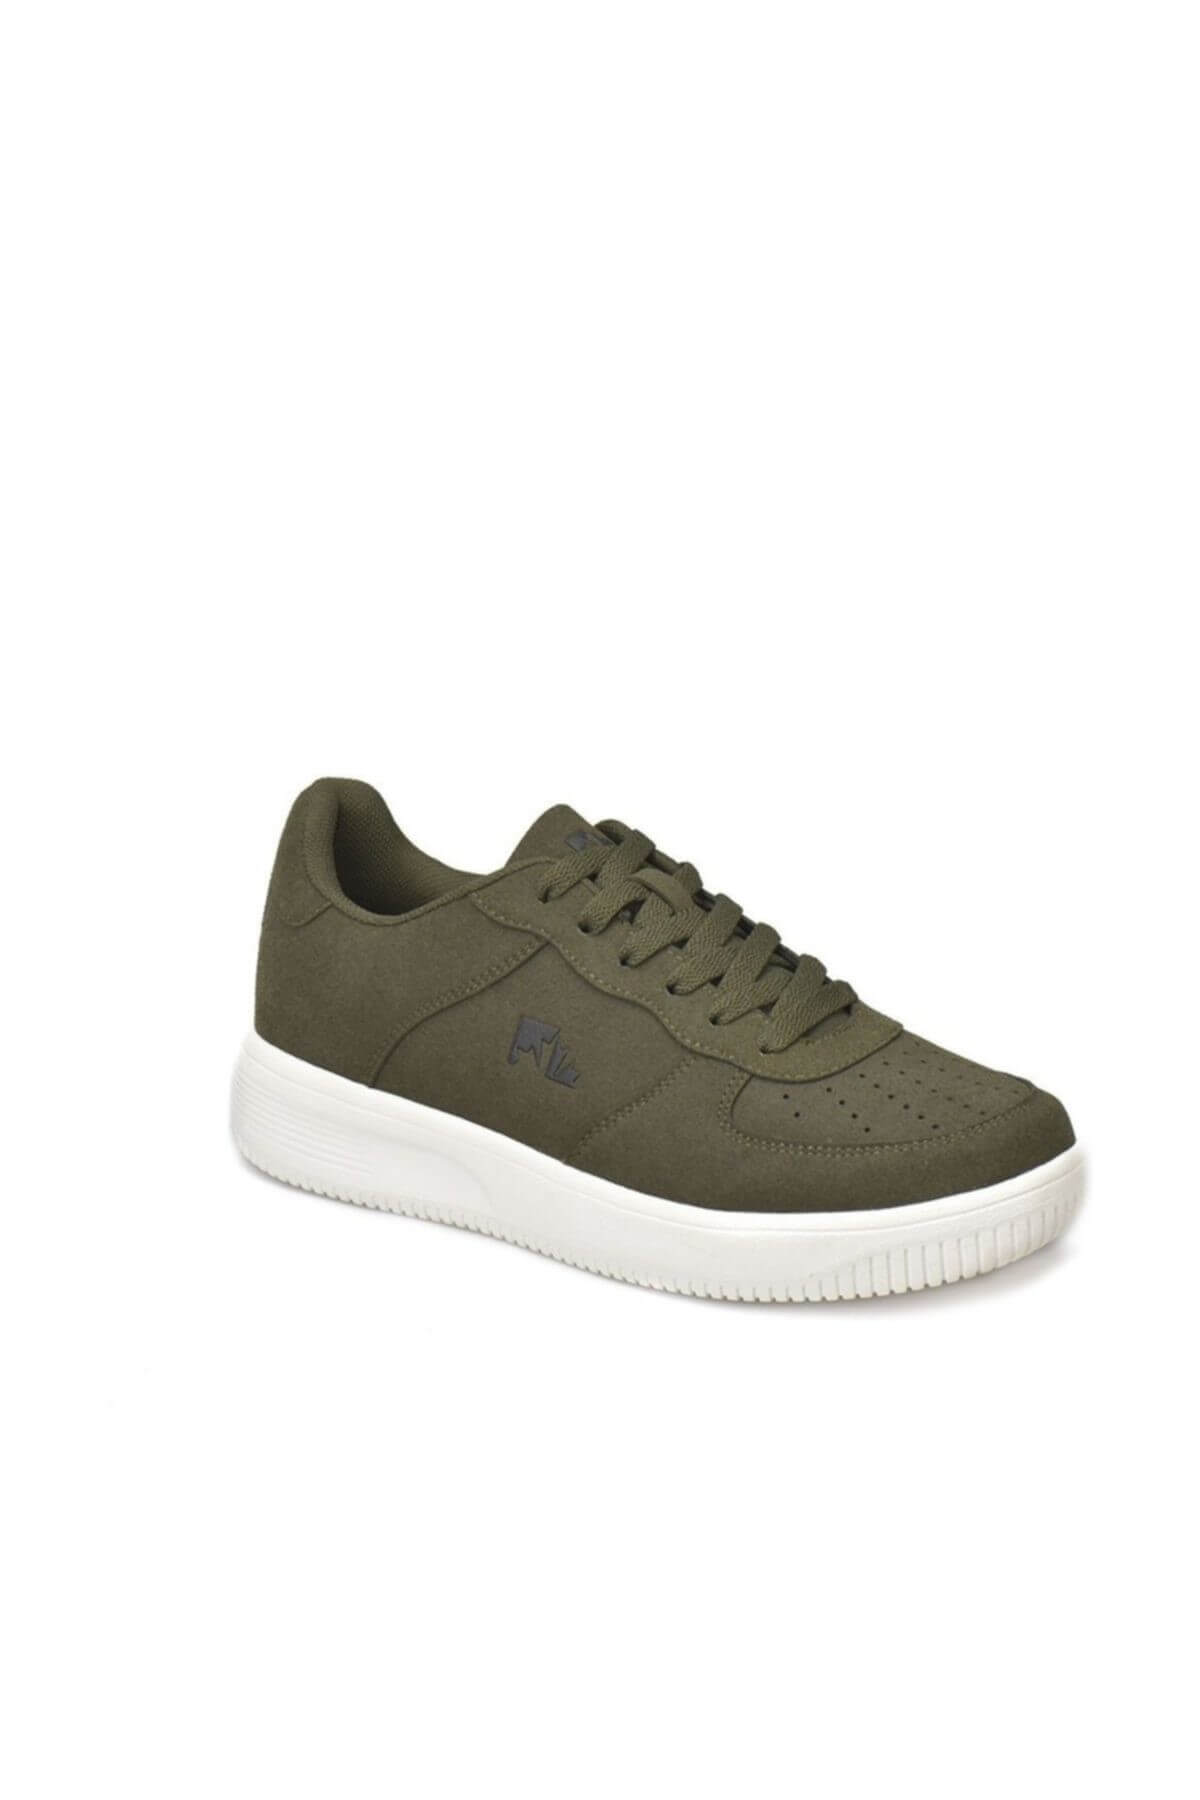 lumberjack Finster Sue Haki Erkek Sneaker Ayakkabı 100329395 1